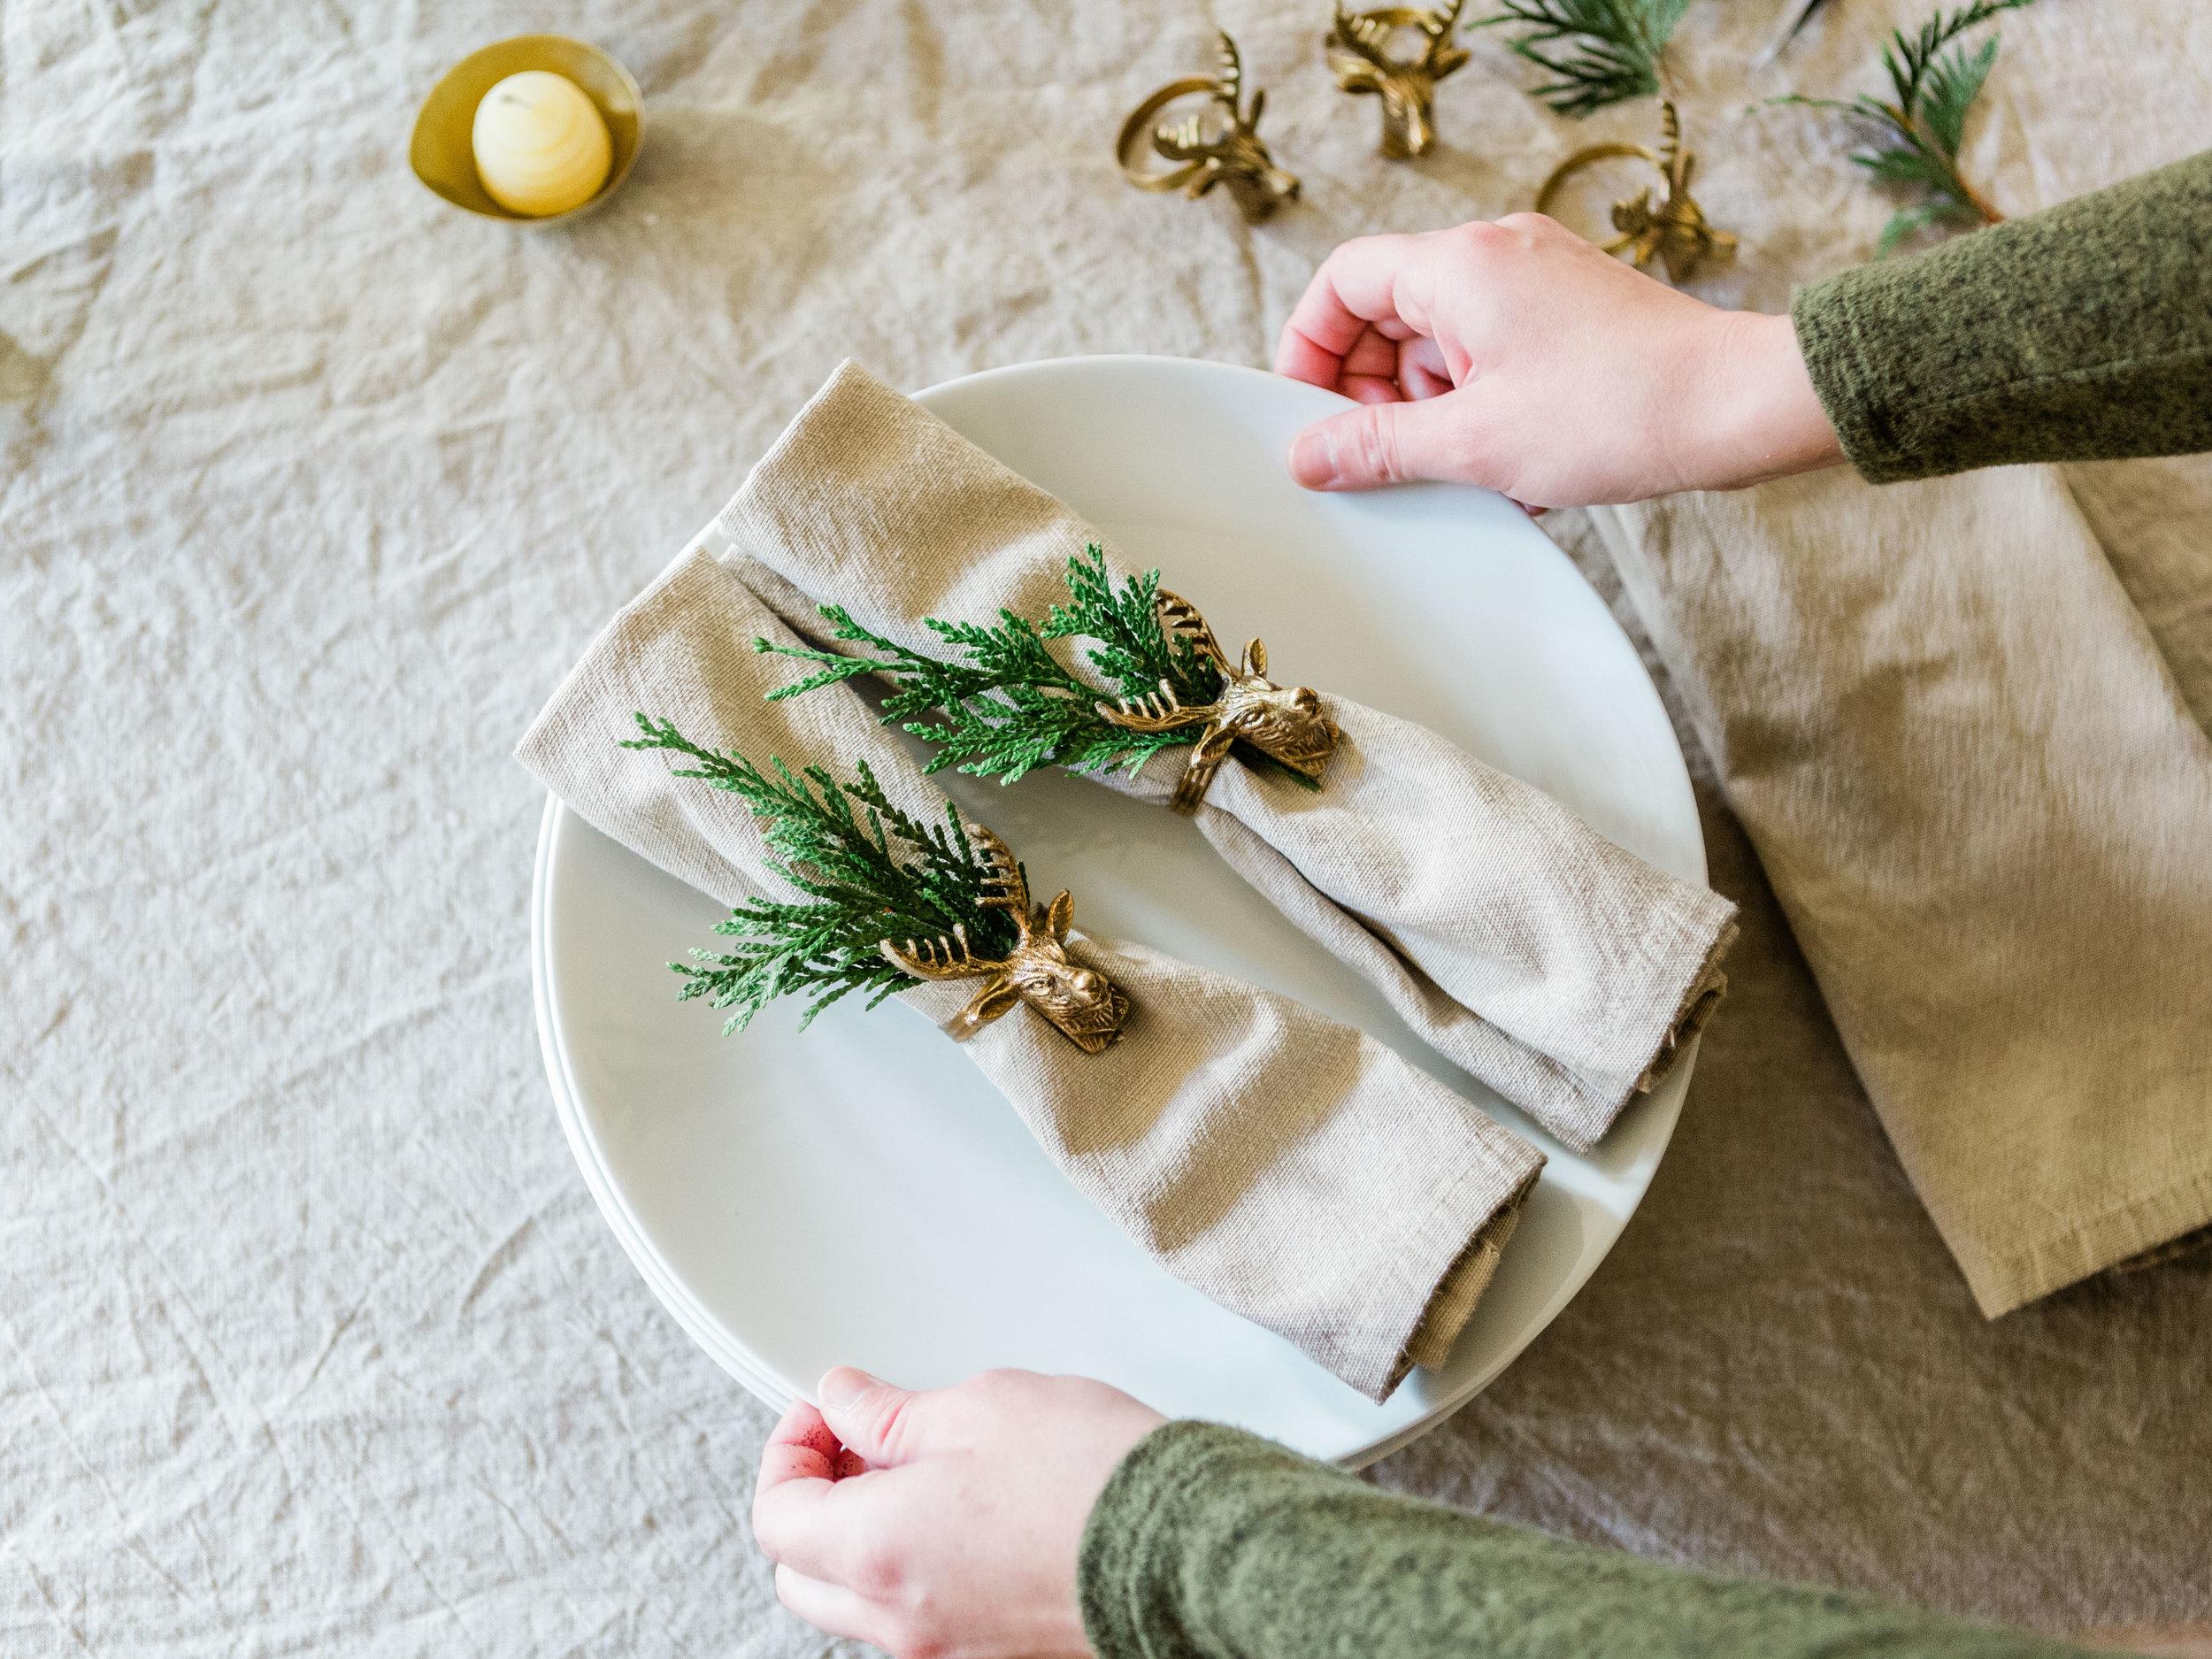 Gold deer napkin rings    Beeswax tealights    Metal bowls